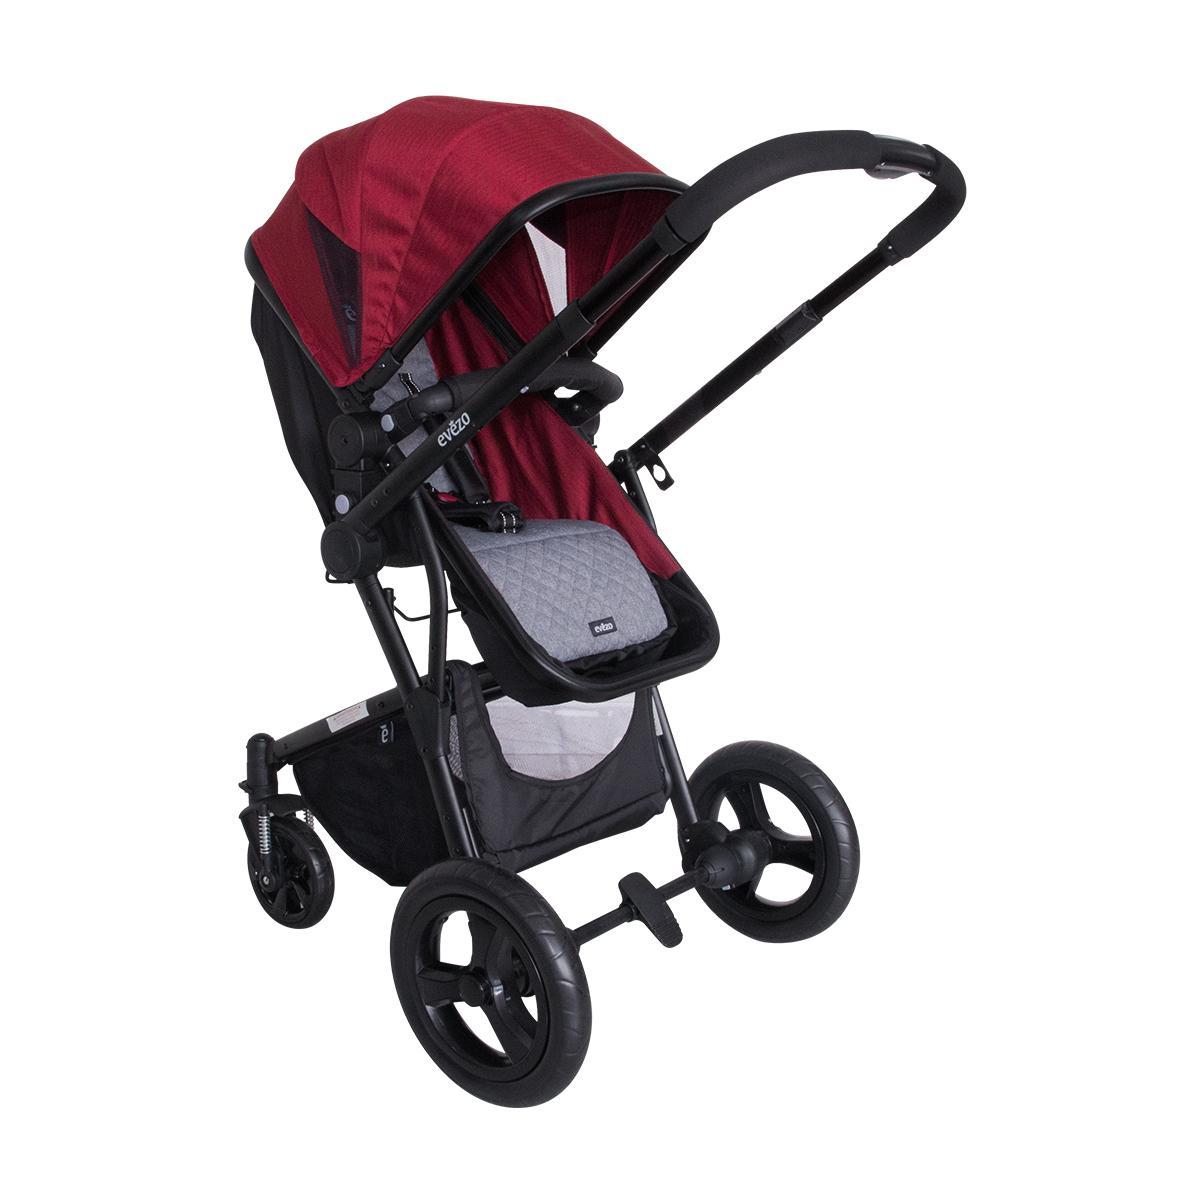 COCHE BABY STROLLER FAZIO DELUXE – EV125